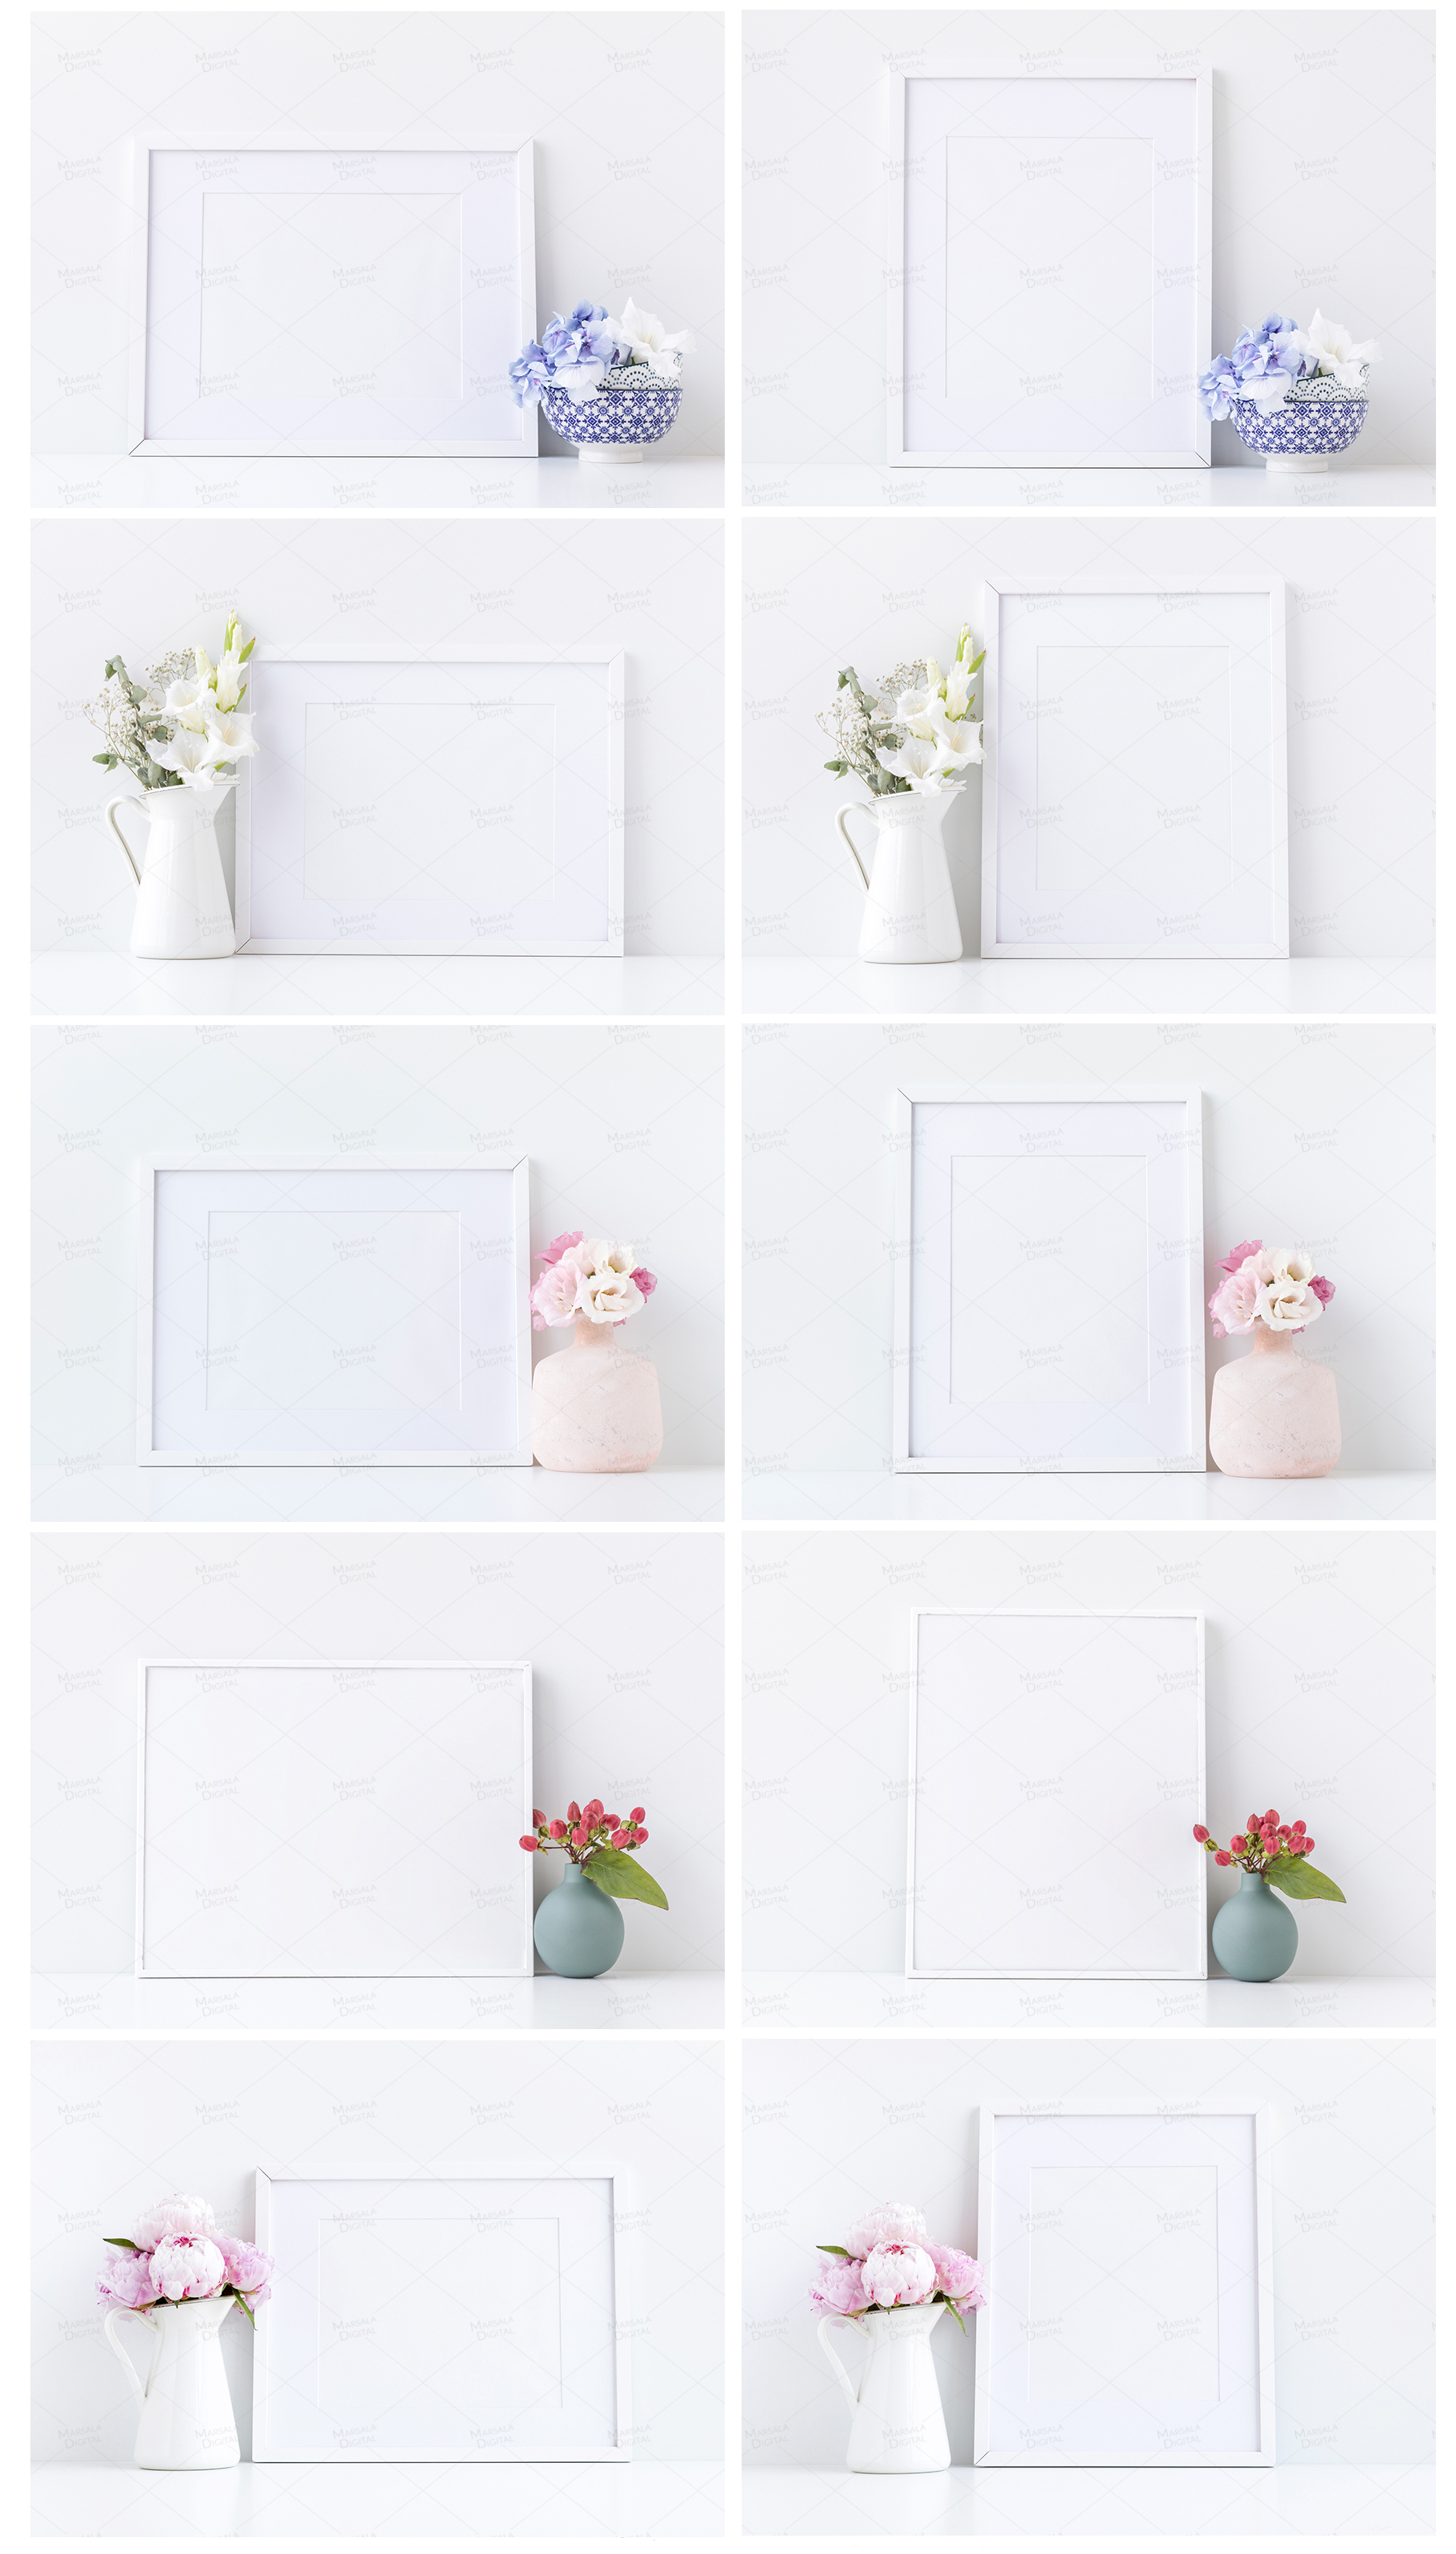 Massive Interior Wall Mockup, Frame Mockup Bundle FREE sampl example image 19